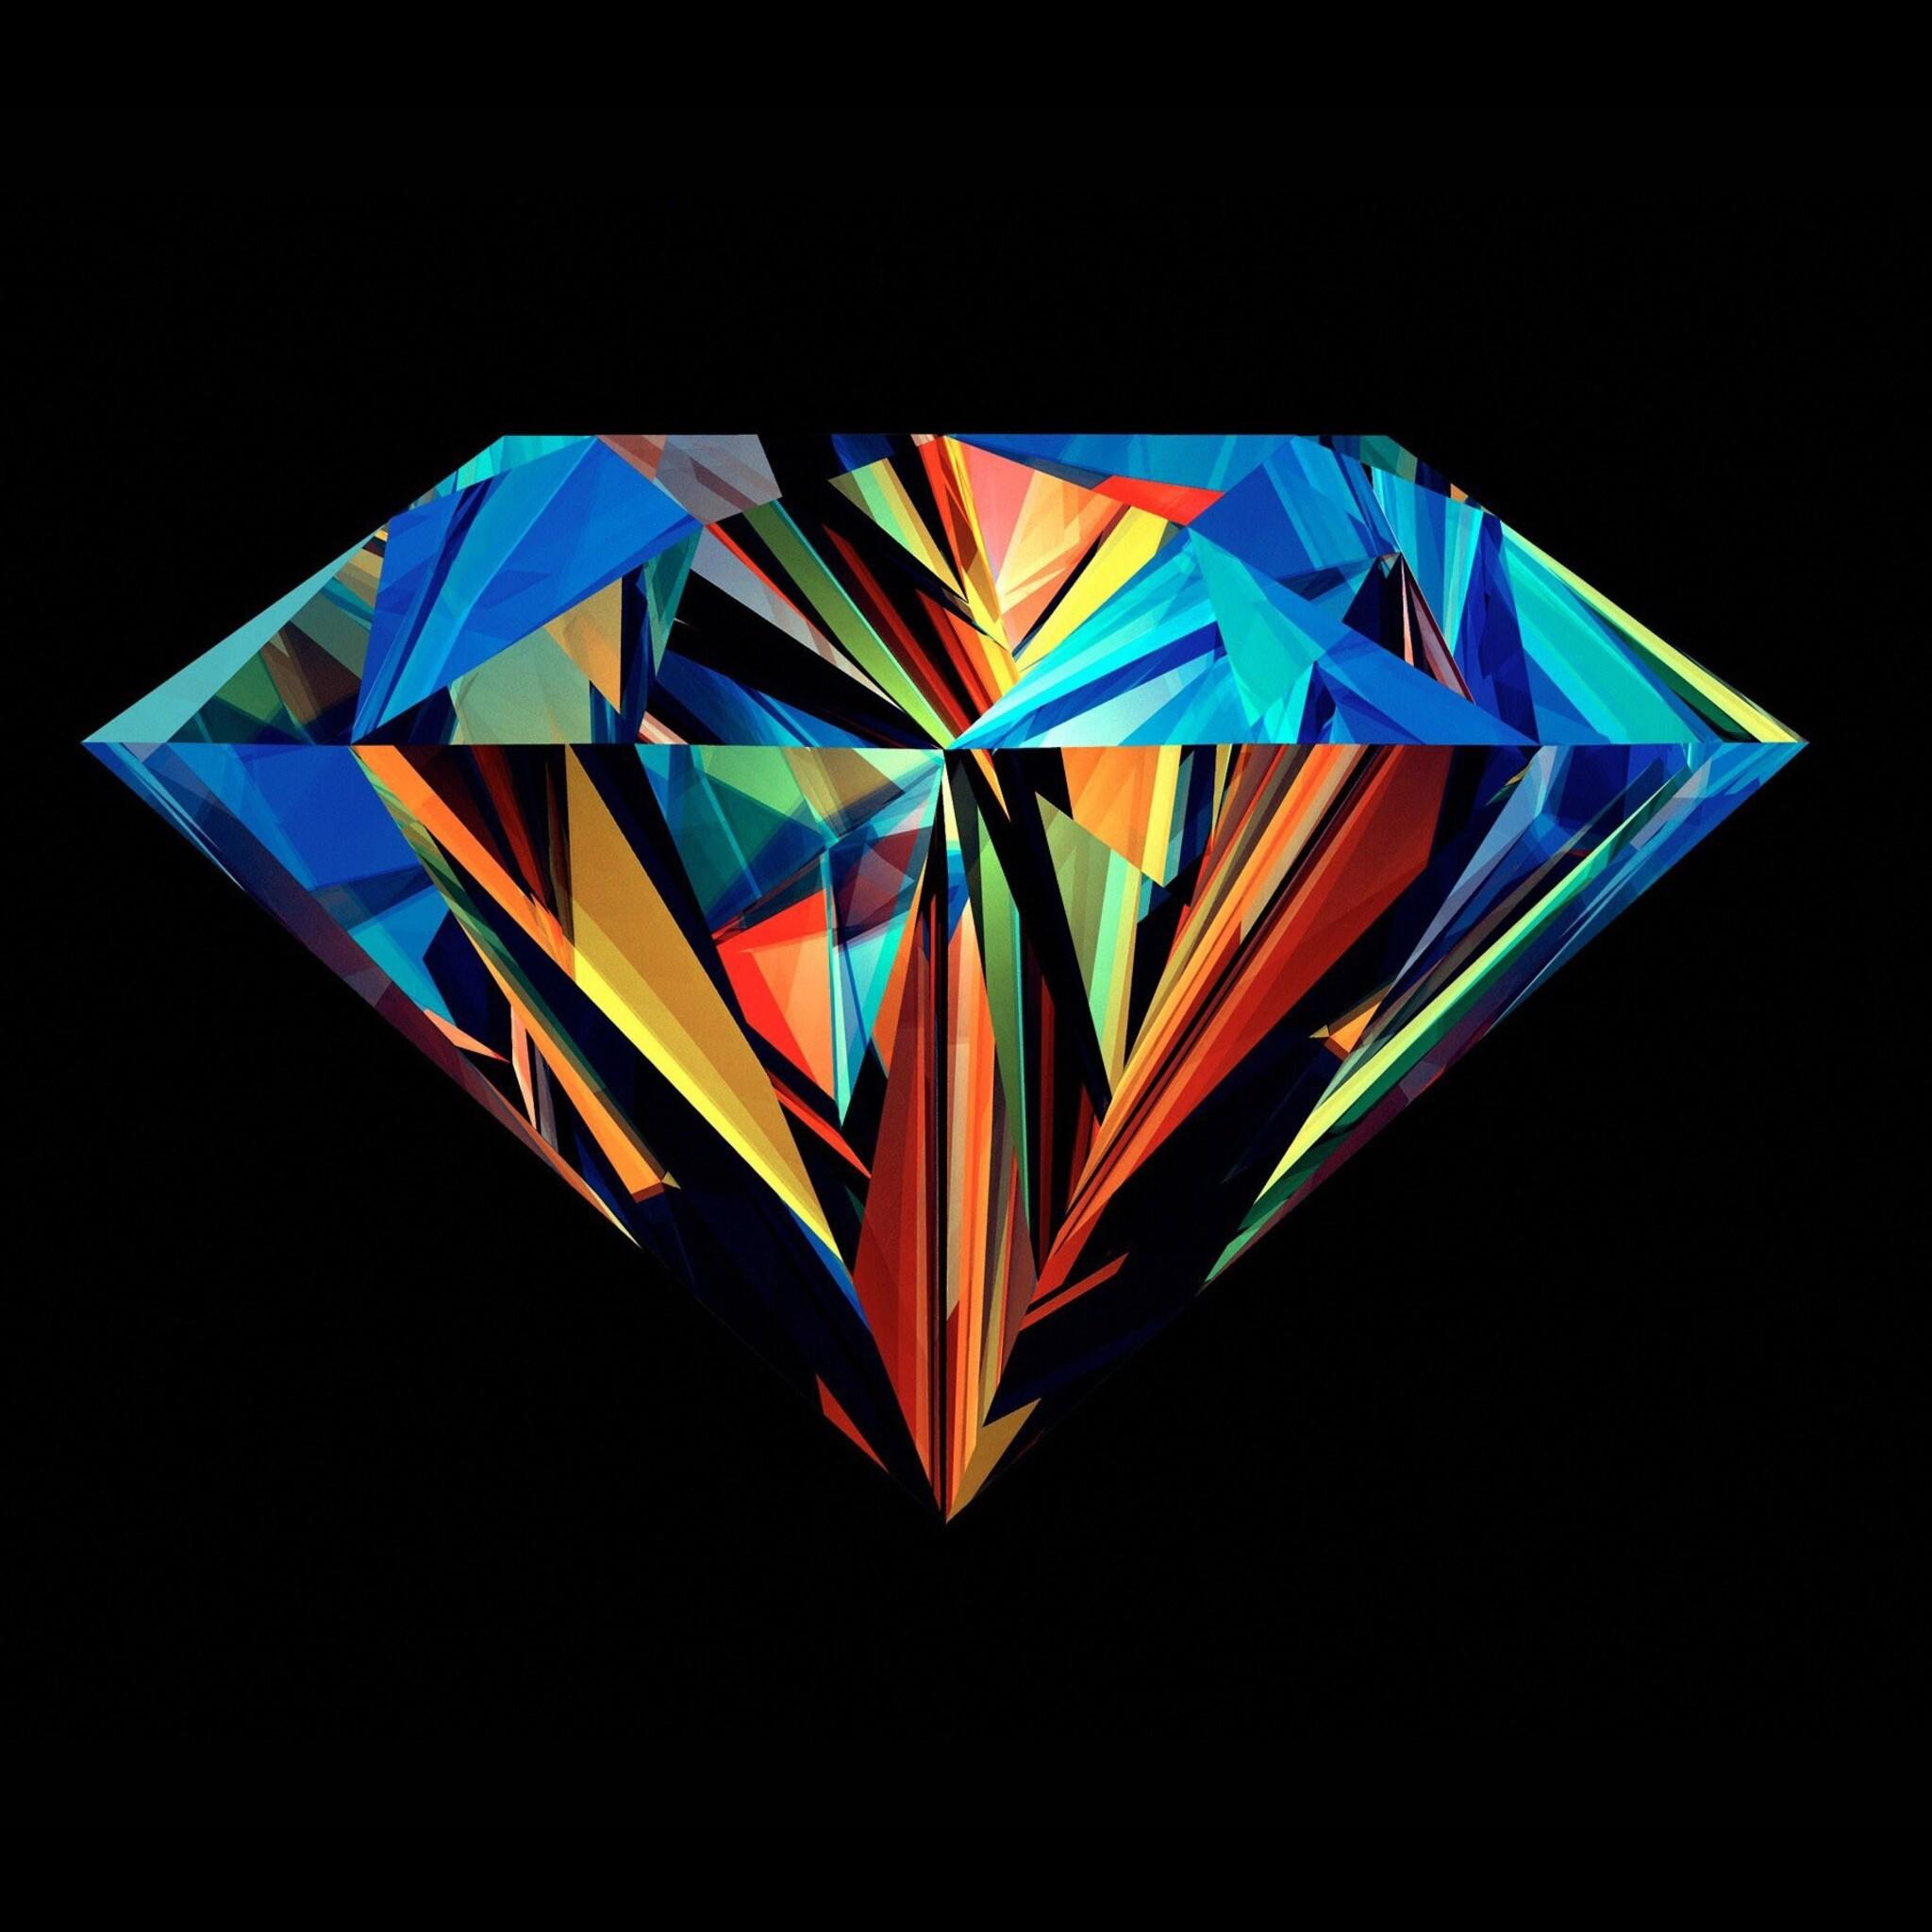 2048x2048 Diamond Abstract Ipad Air HD 4k Wallpapers